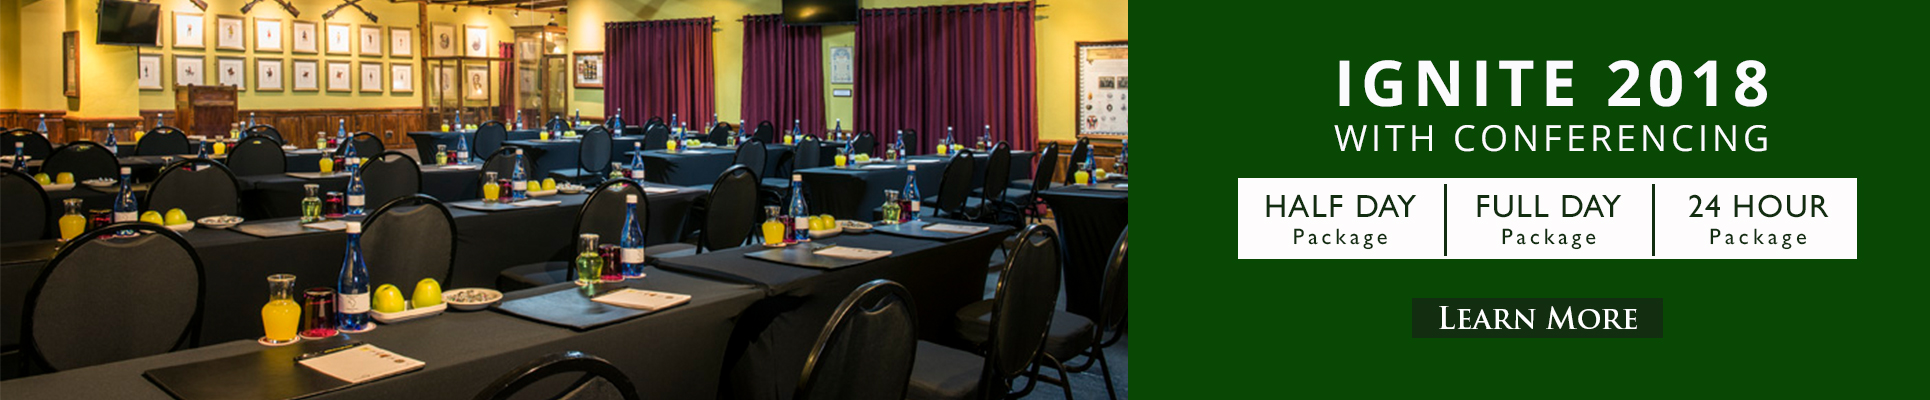 Kedar Heritage Lodge Conference Specials 2018